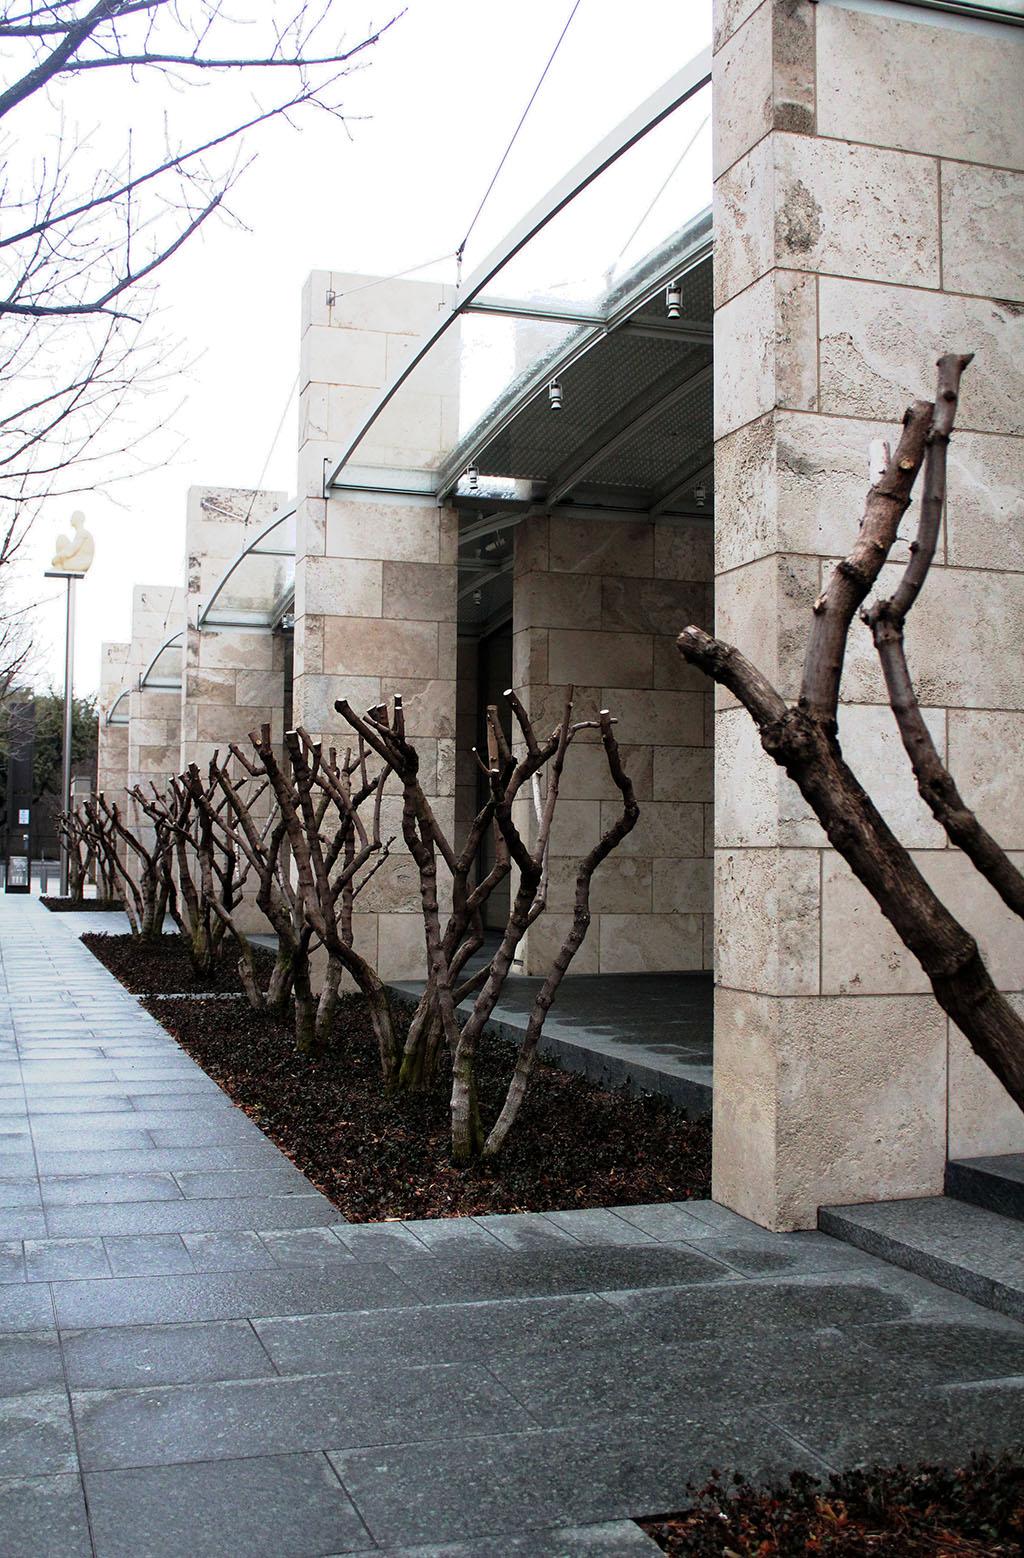 Nasher Sculpture Centre, Dallas - Photo Essay by Amit Khanna (1).JPG